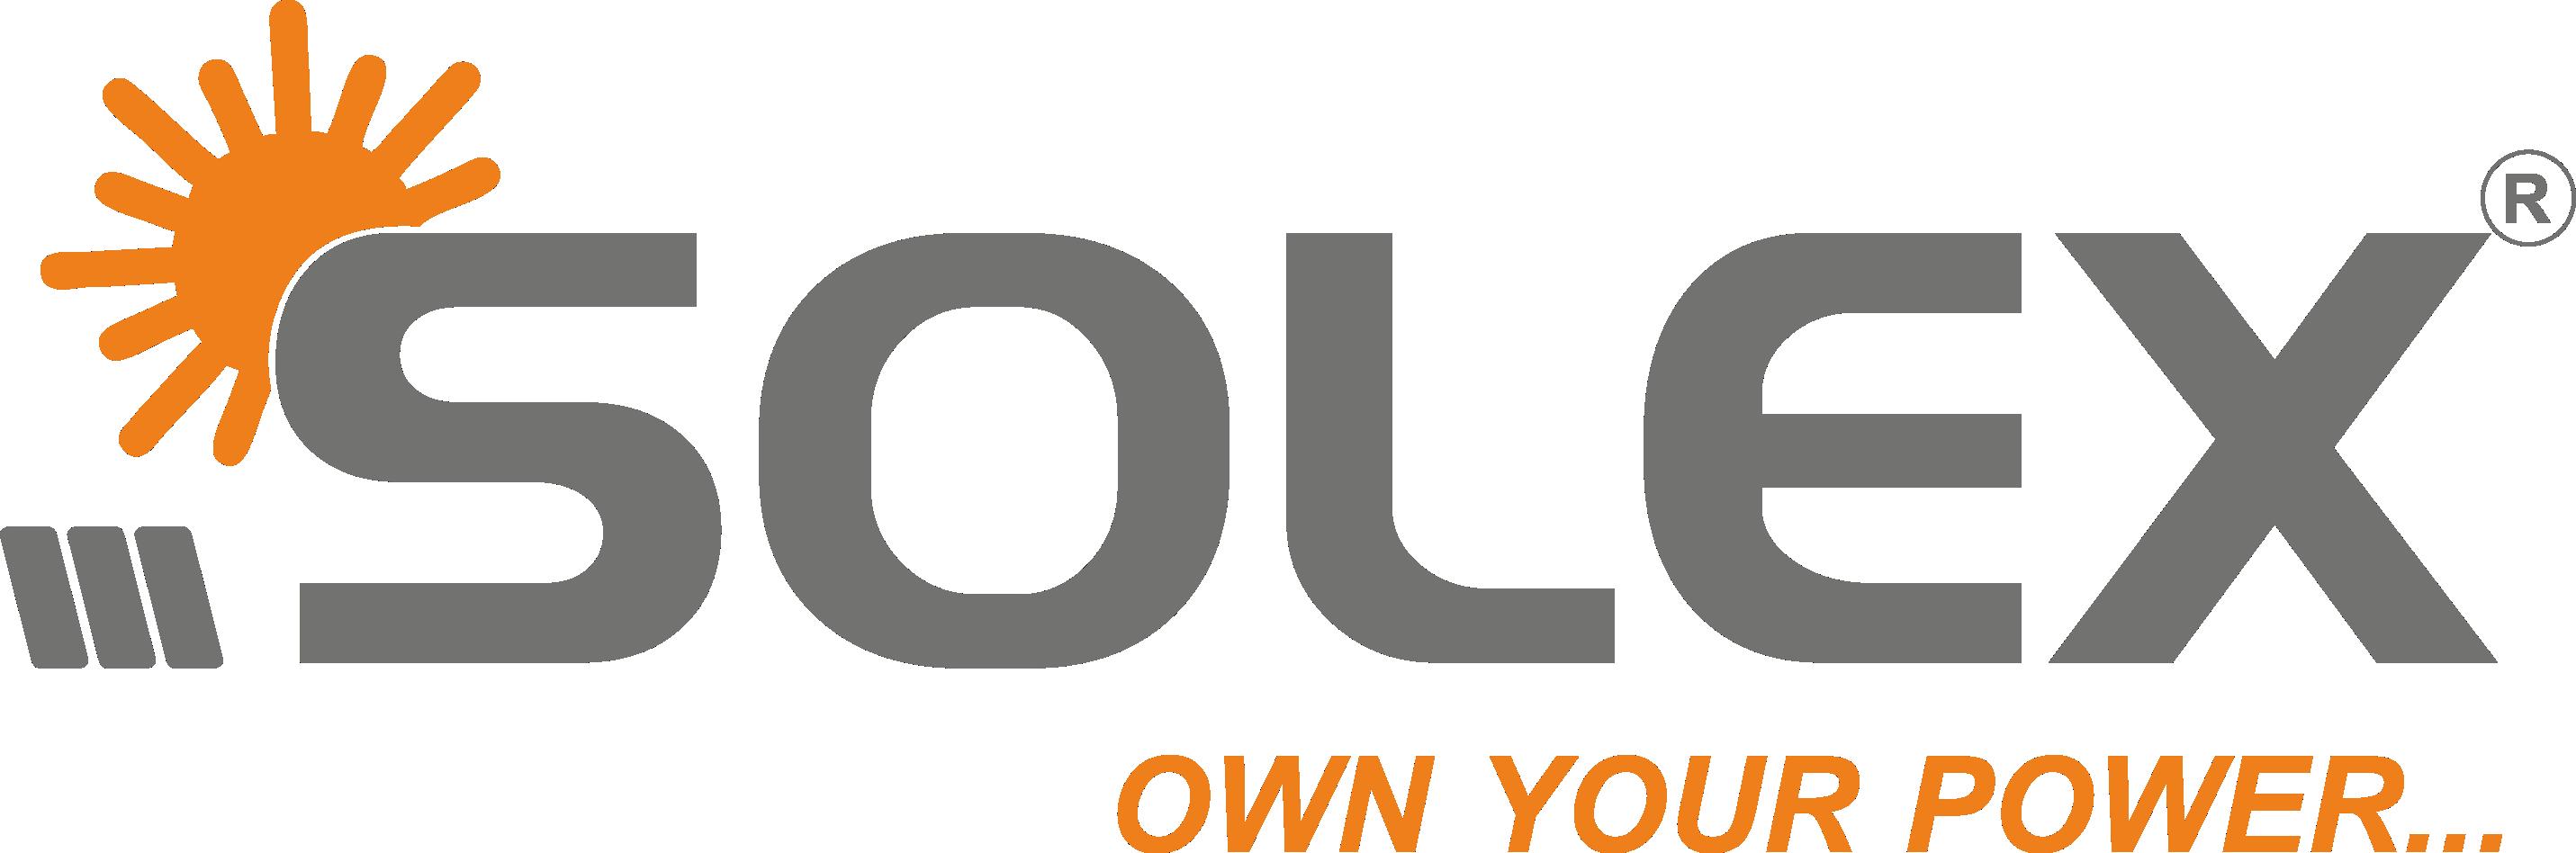 Solex MOU With Jinchen for 1.2 GW PV Module Line